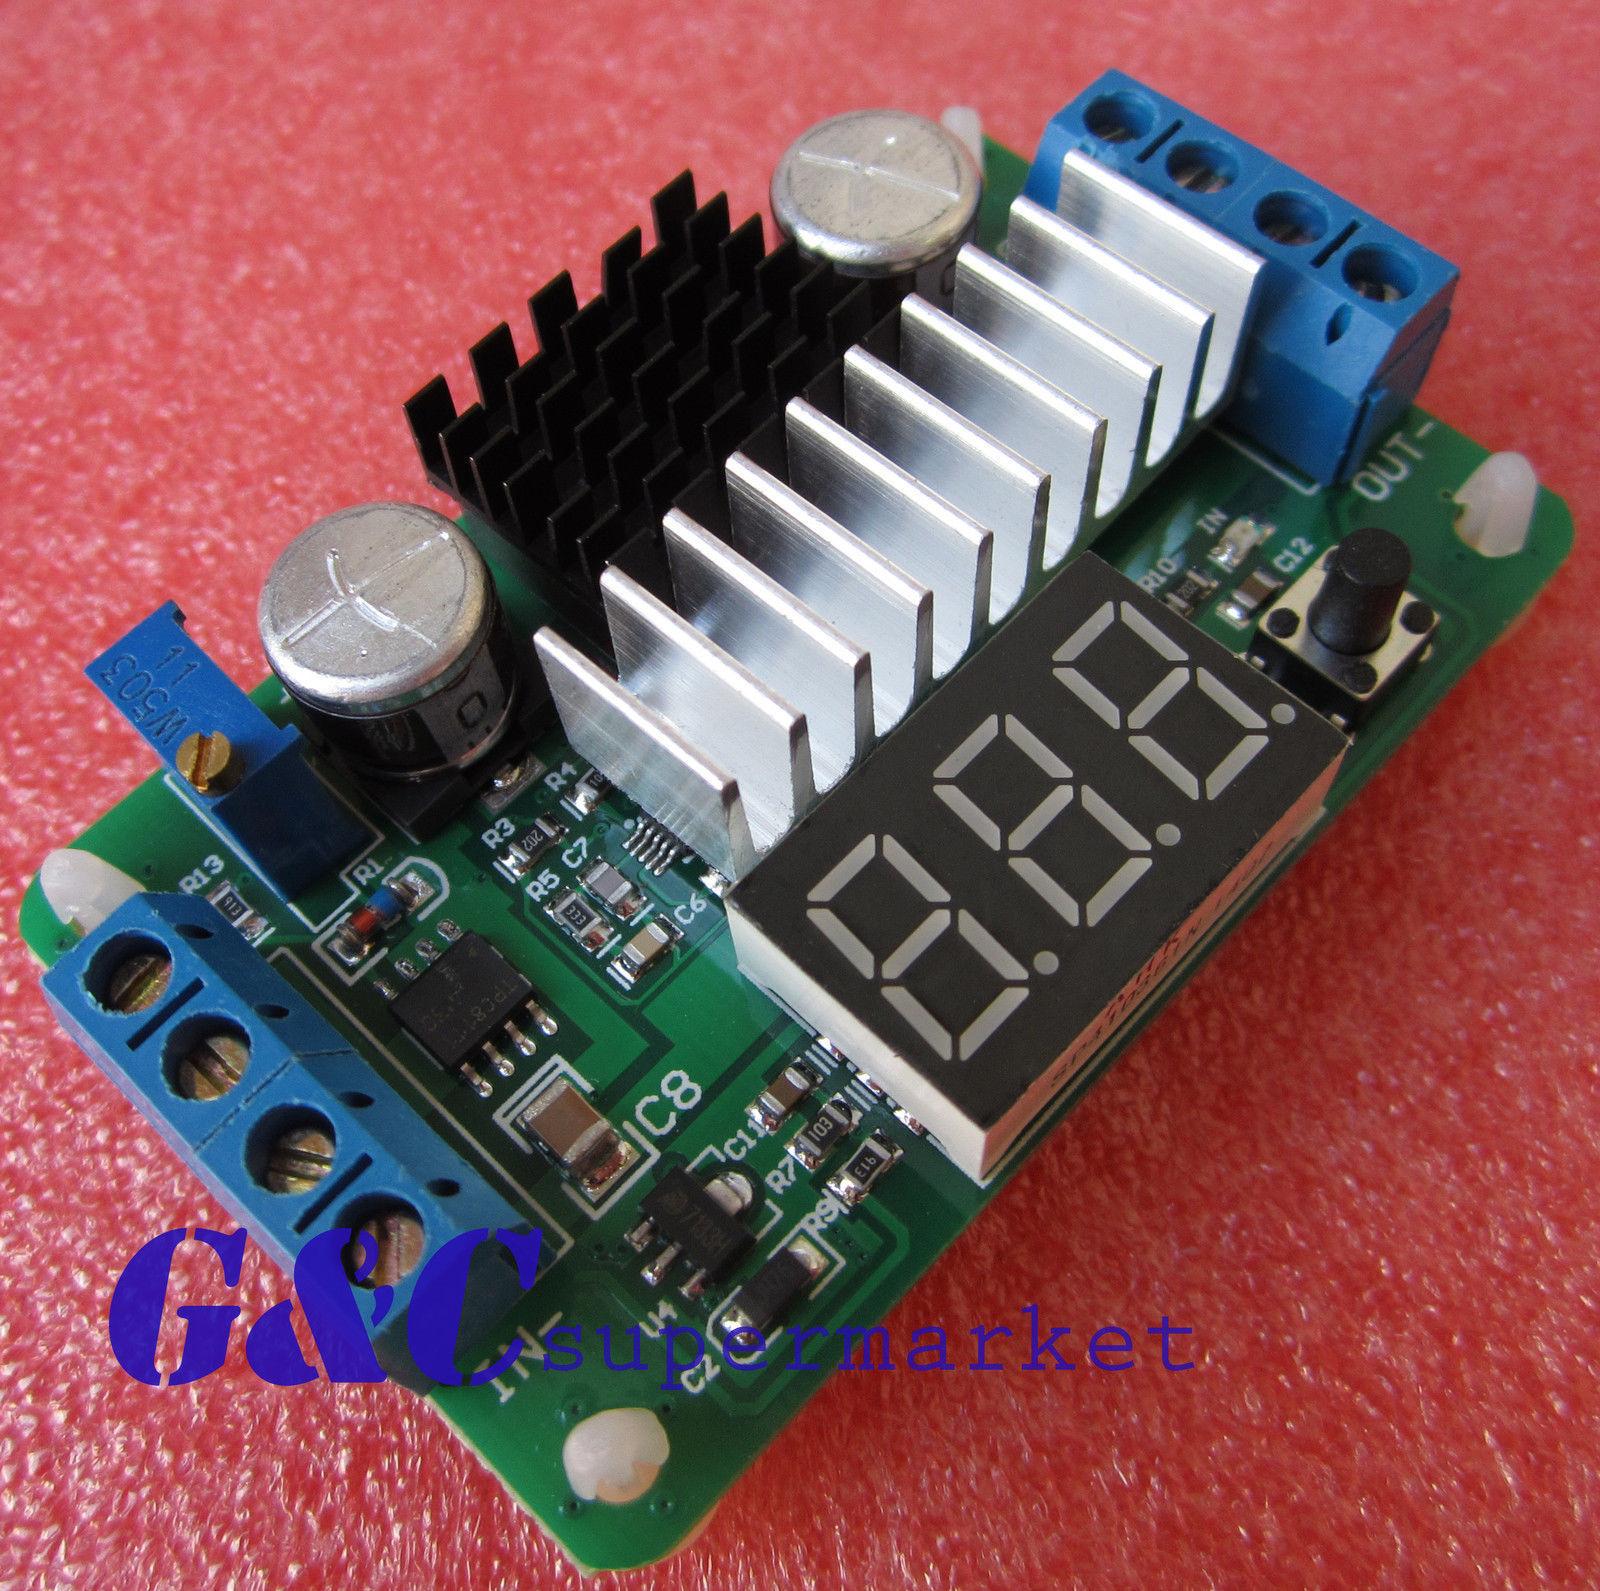 100w 6a Dc Power Source Step Up Converter Ltc1871 35v 30v 5v Boost Module 12v Adjustable Converters Red Led Voltmeter In Integrated Circuits From